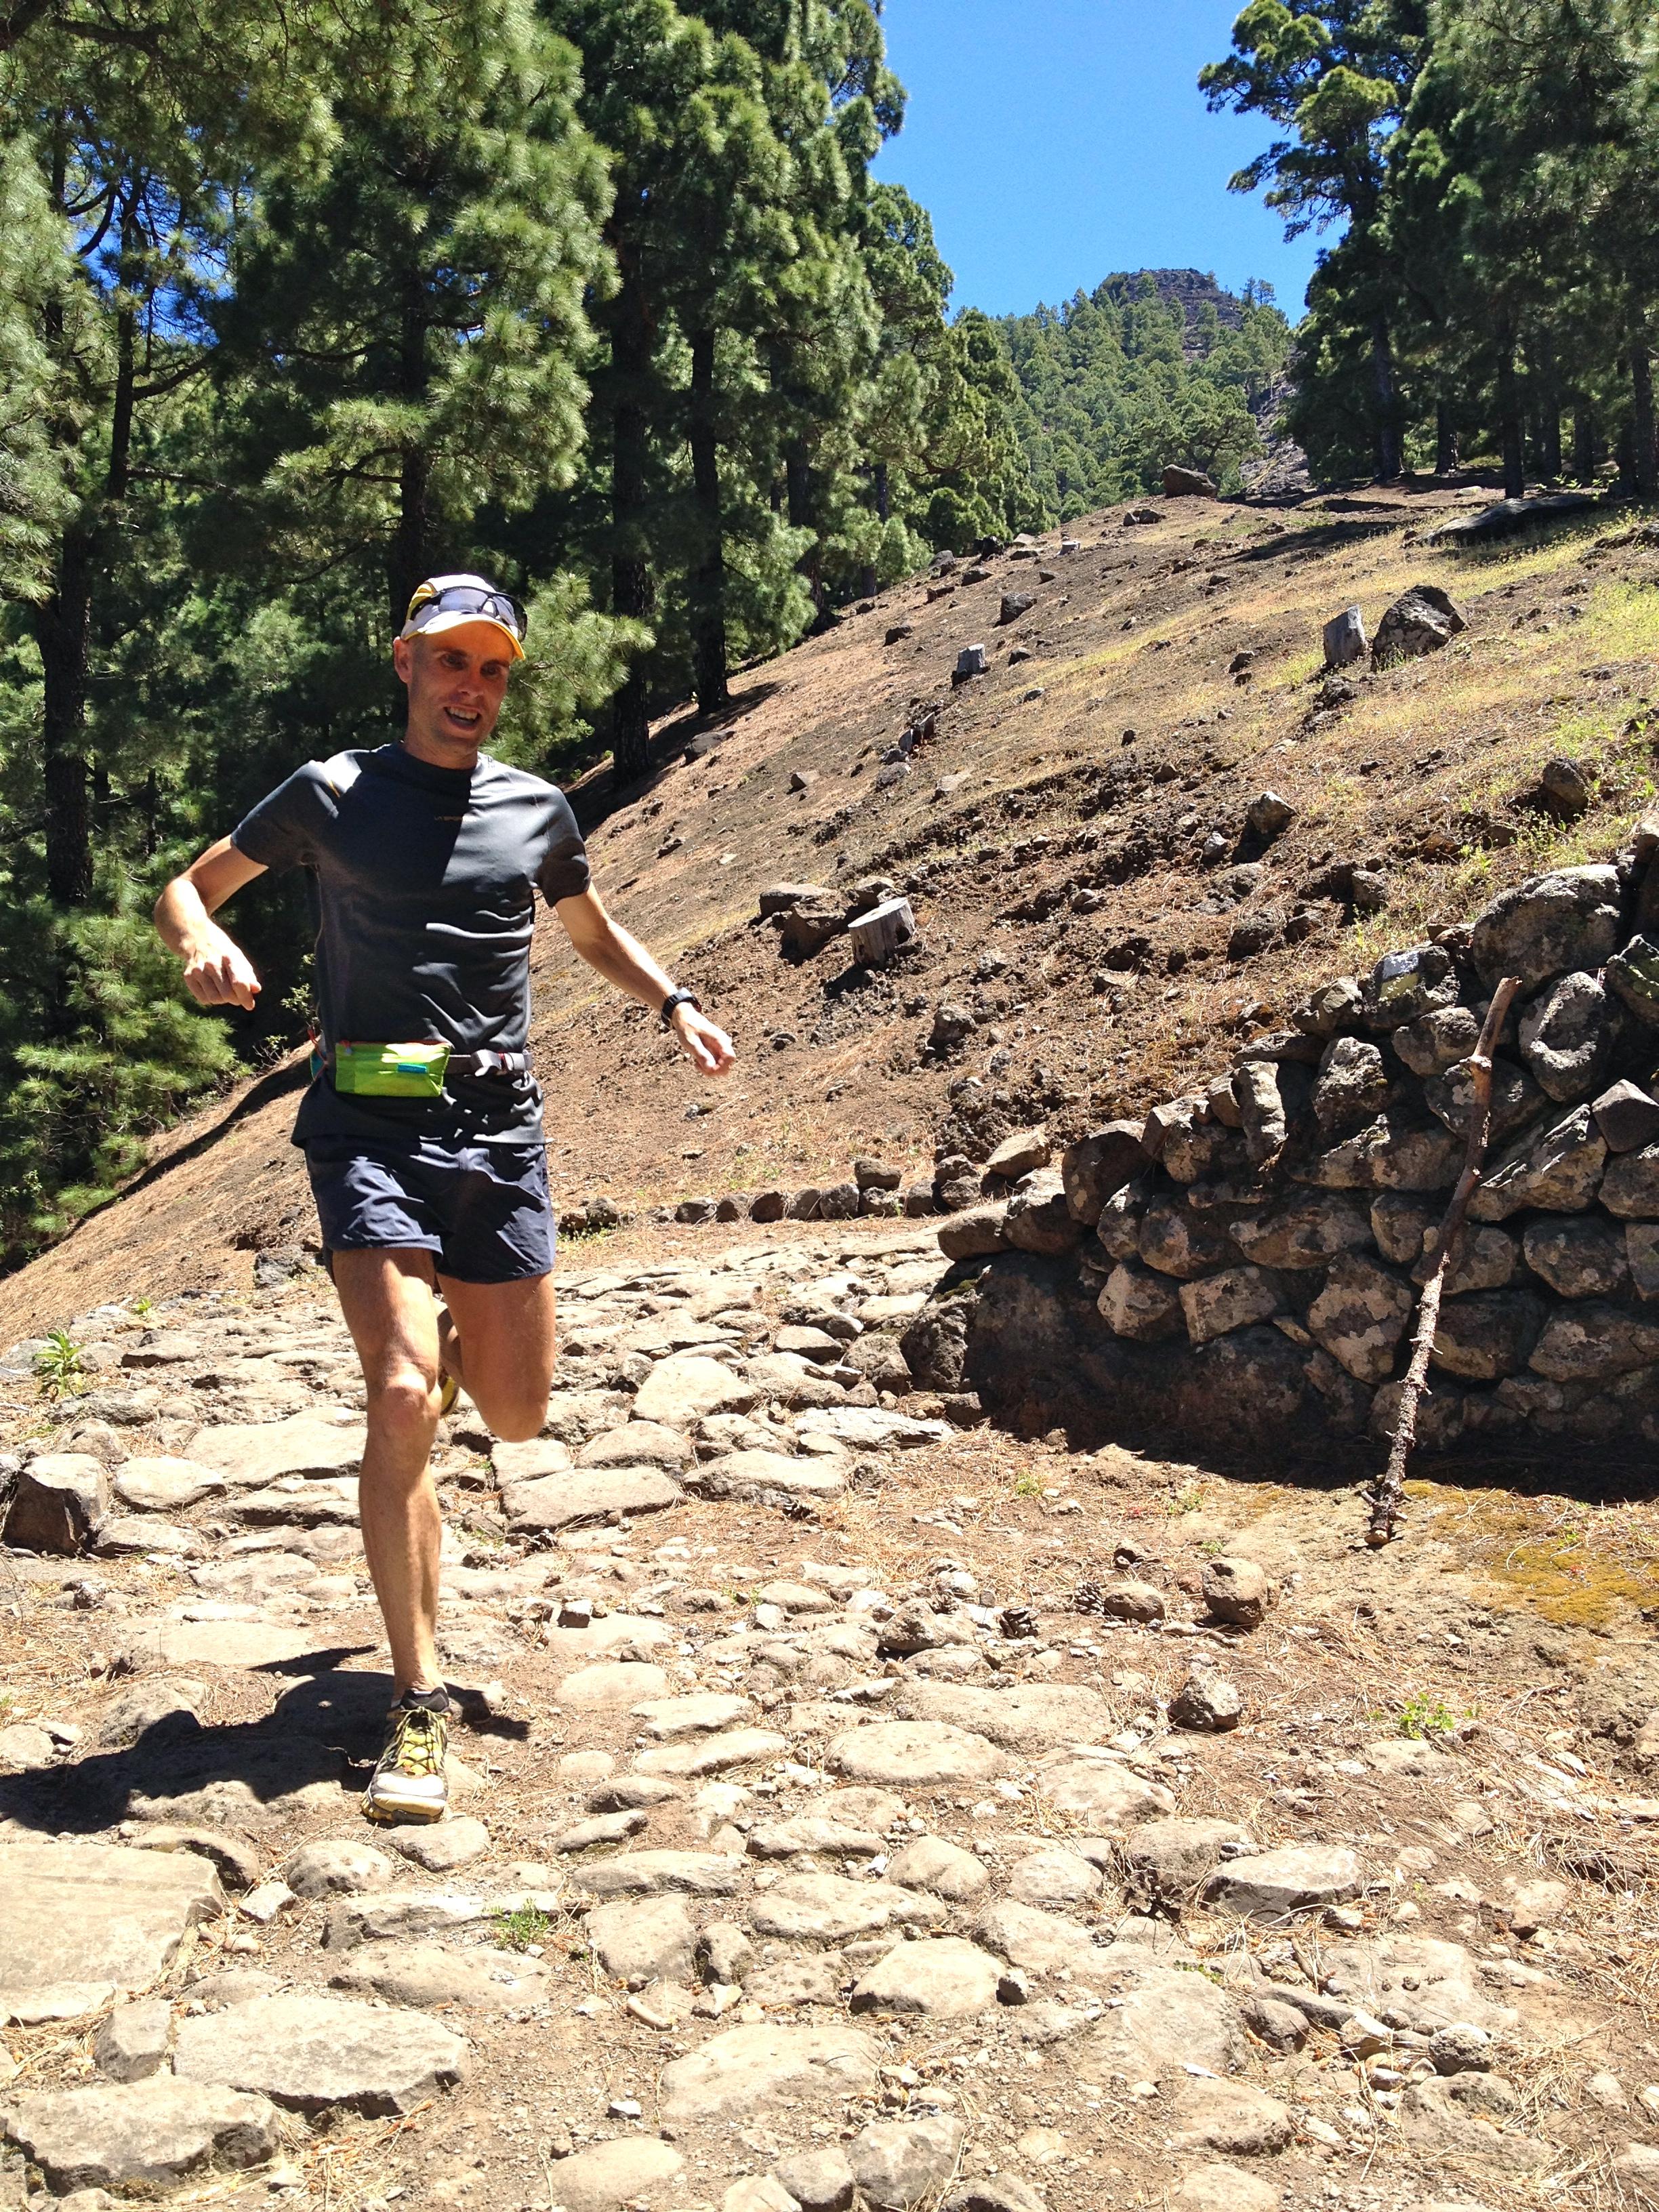 Ultramarathon News Podcasts: Ultramarathon News, Podcasts, And Product Reviews